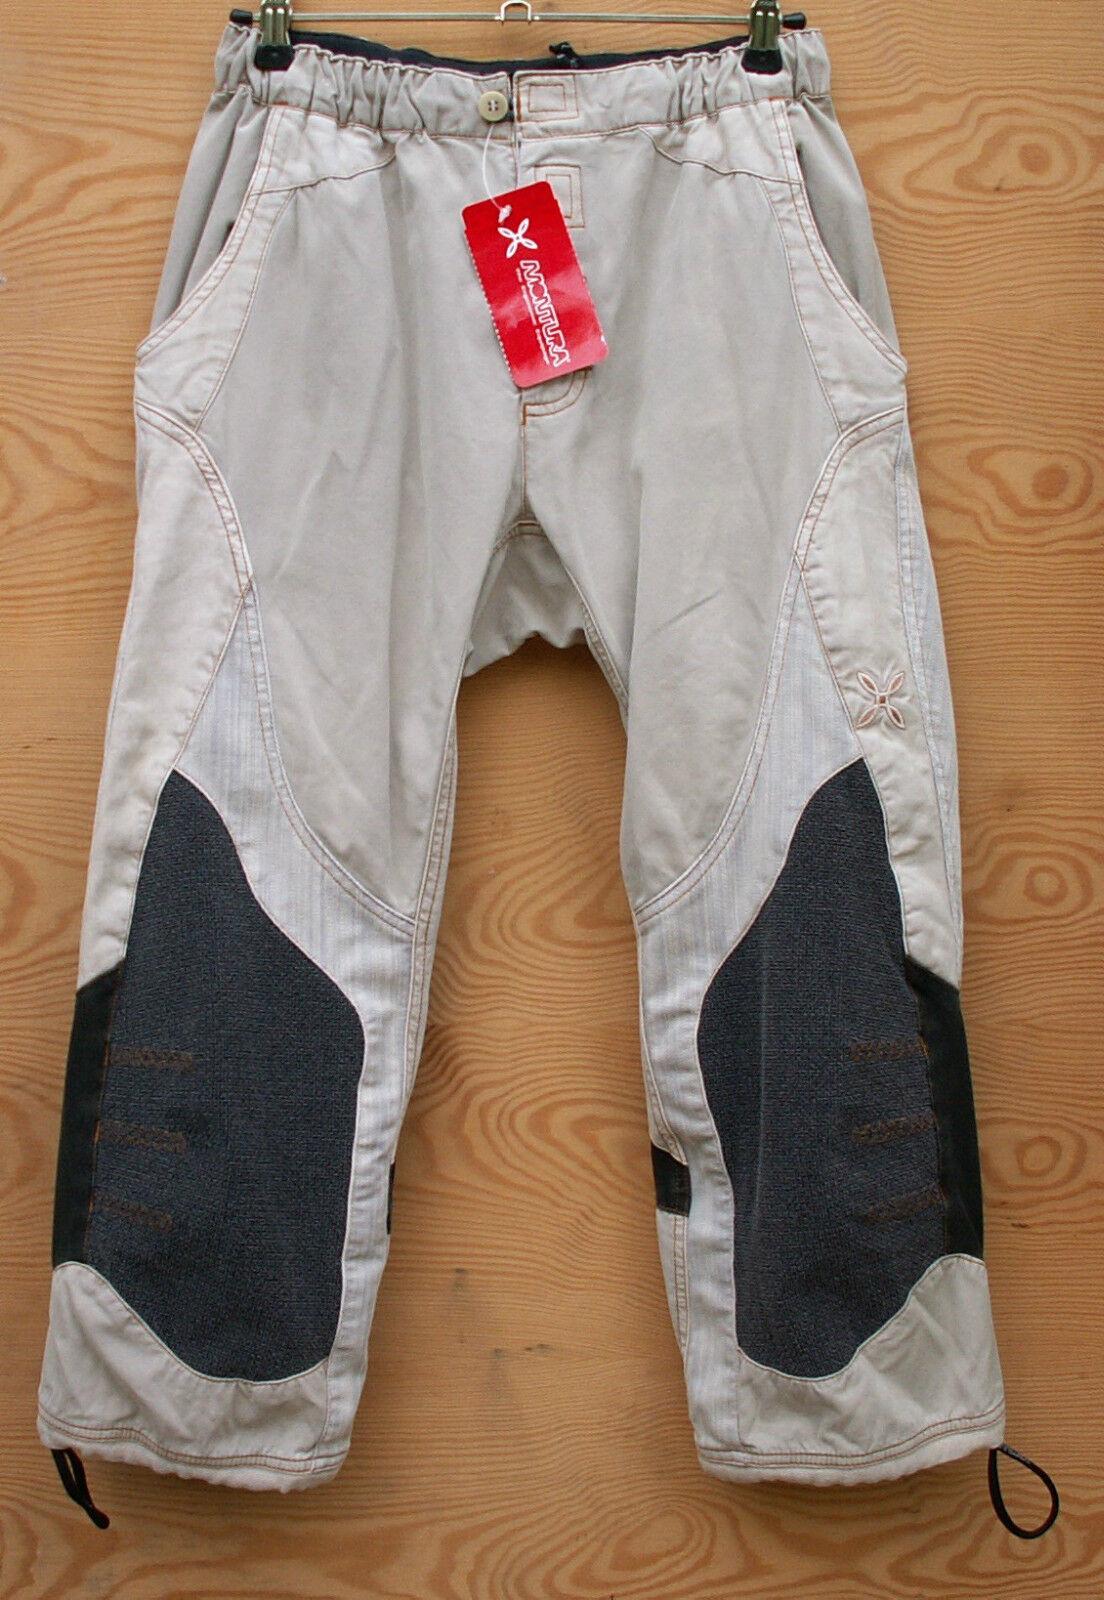 MONTURA Climbing Pants Fusion K.3 4  Trousers Women's, White, Size XS  low-key luxury connotation